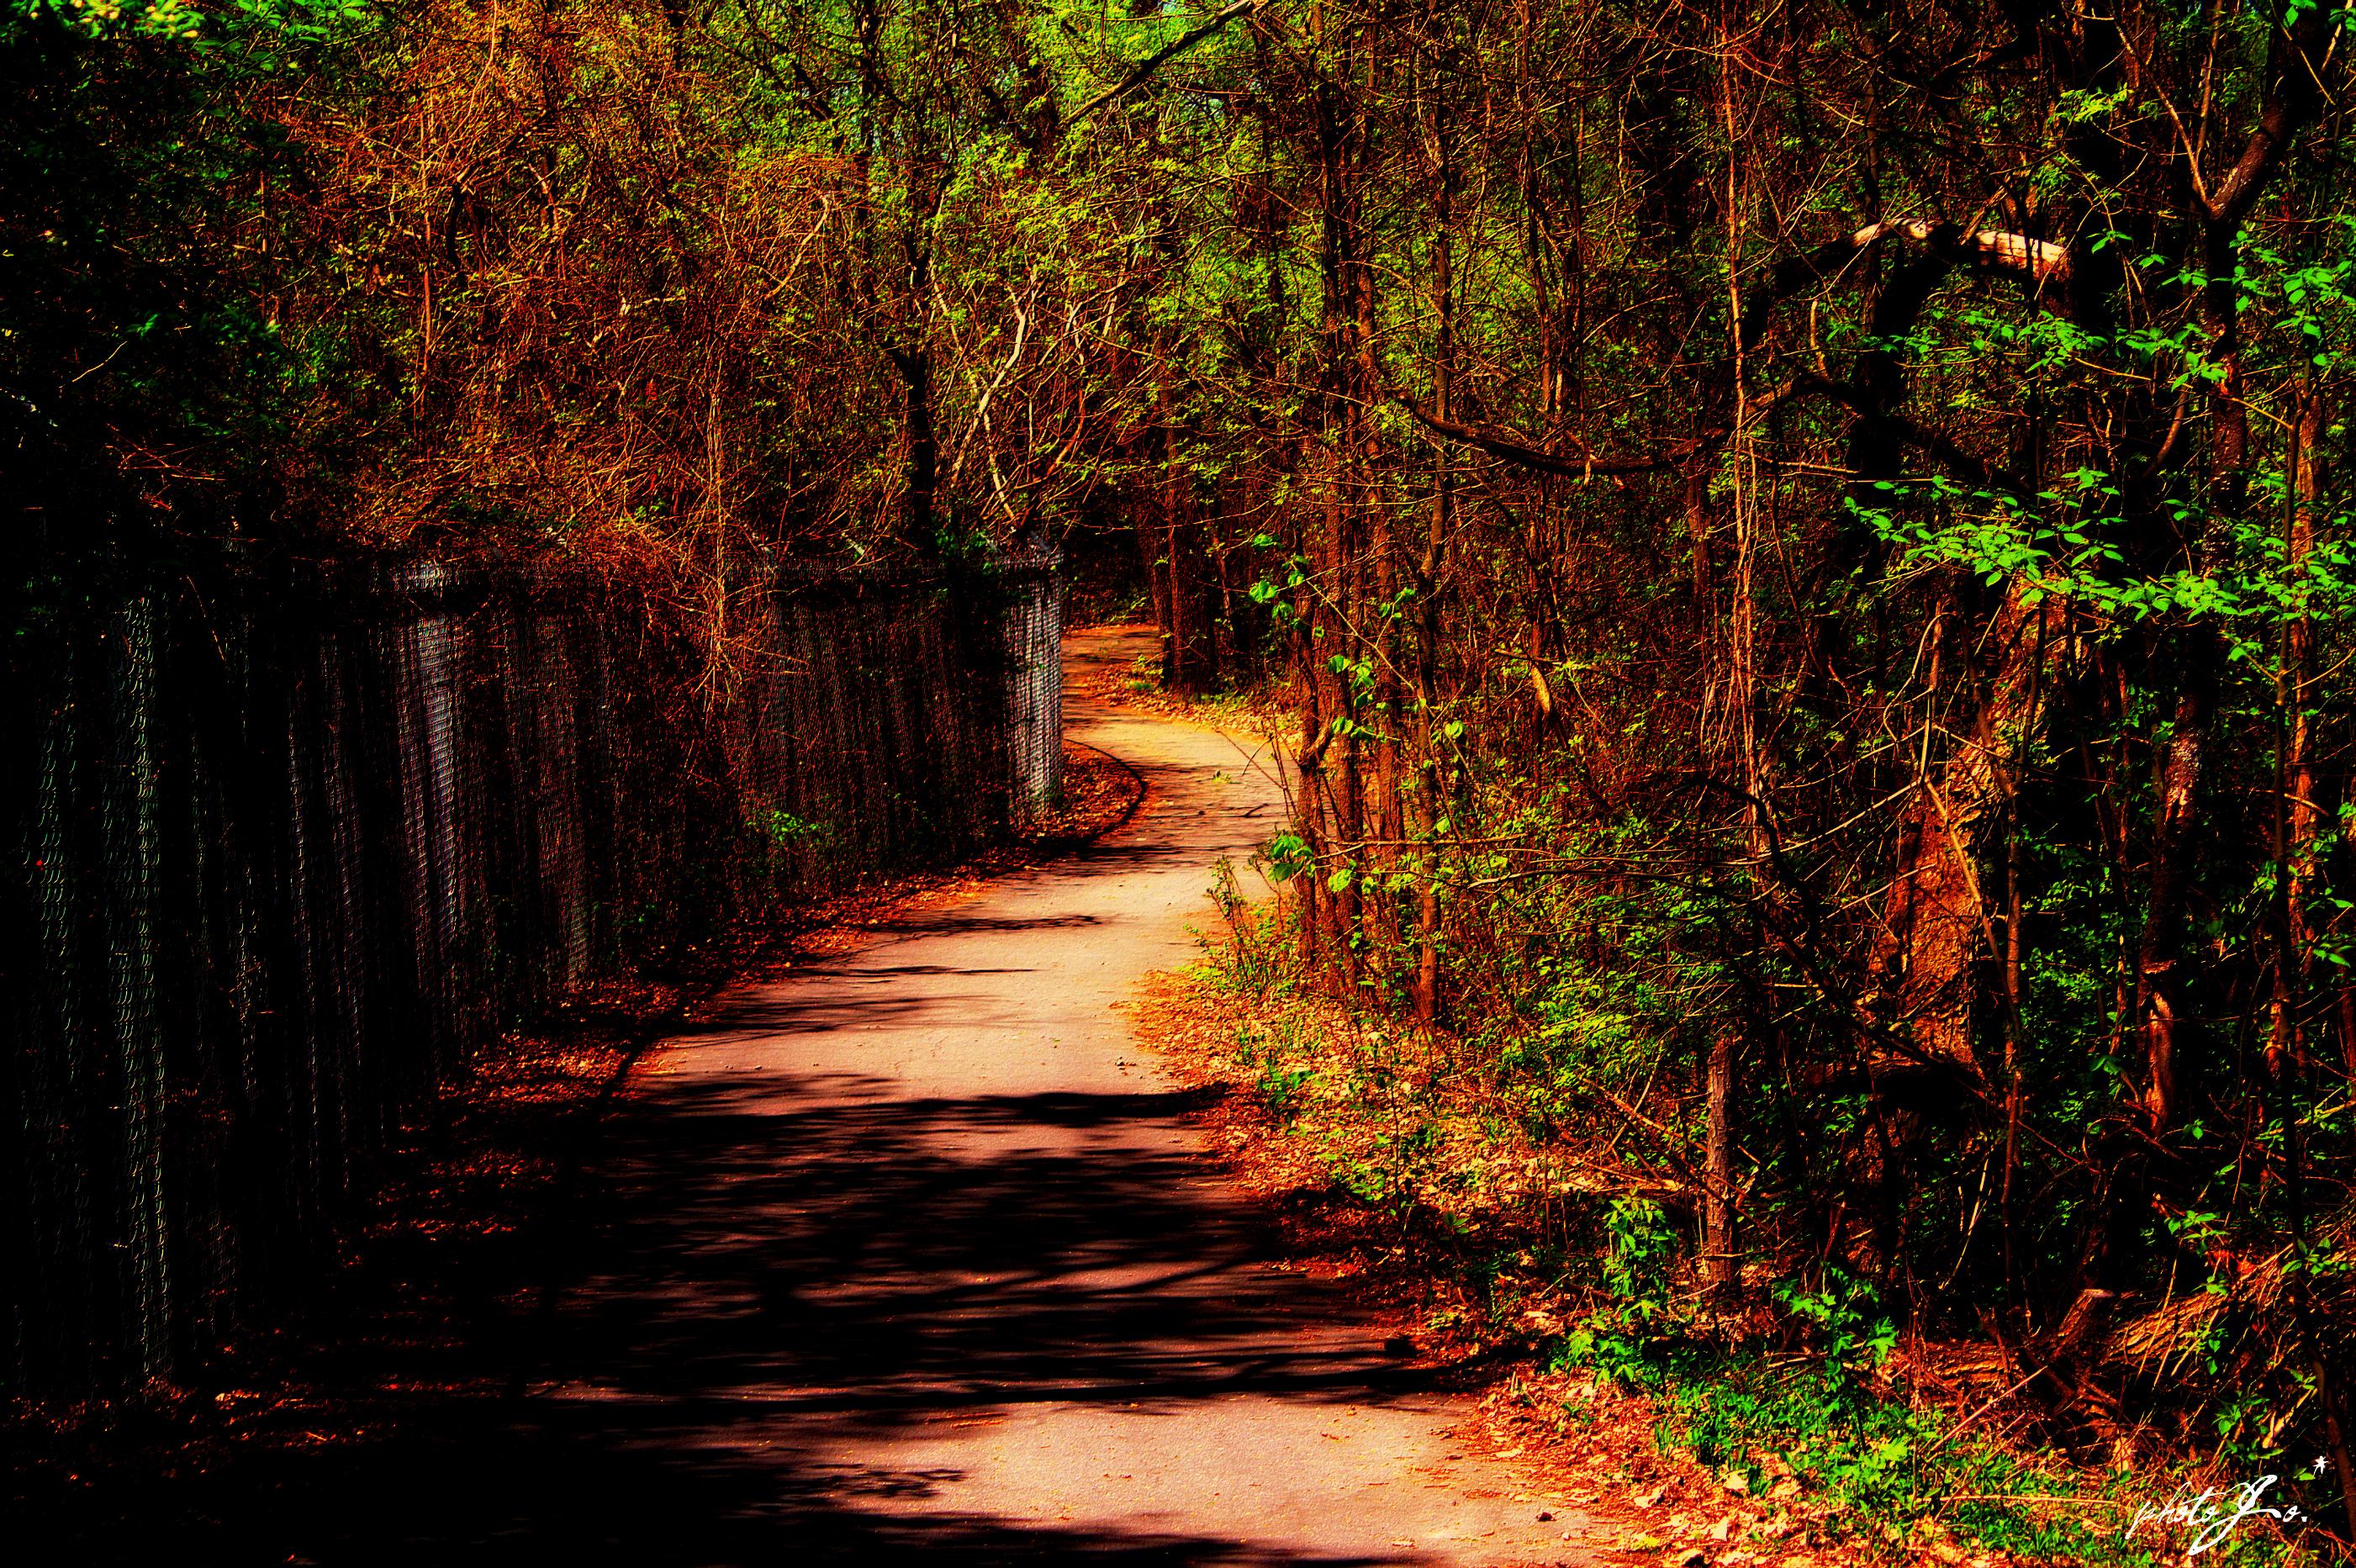 дорога забор кусты road the fence bushes без смс